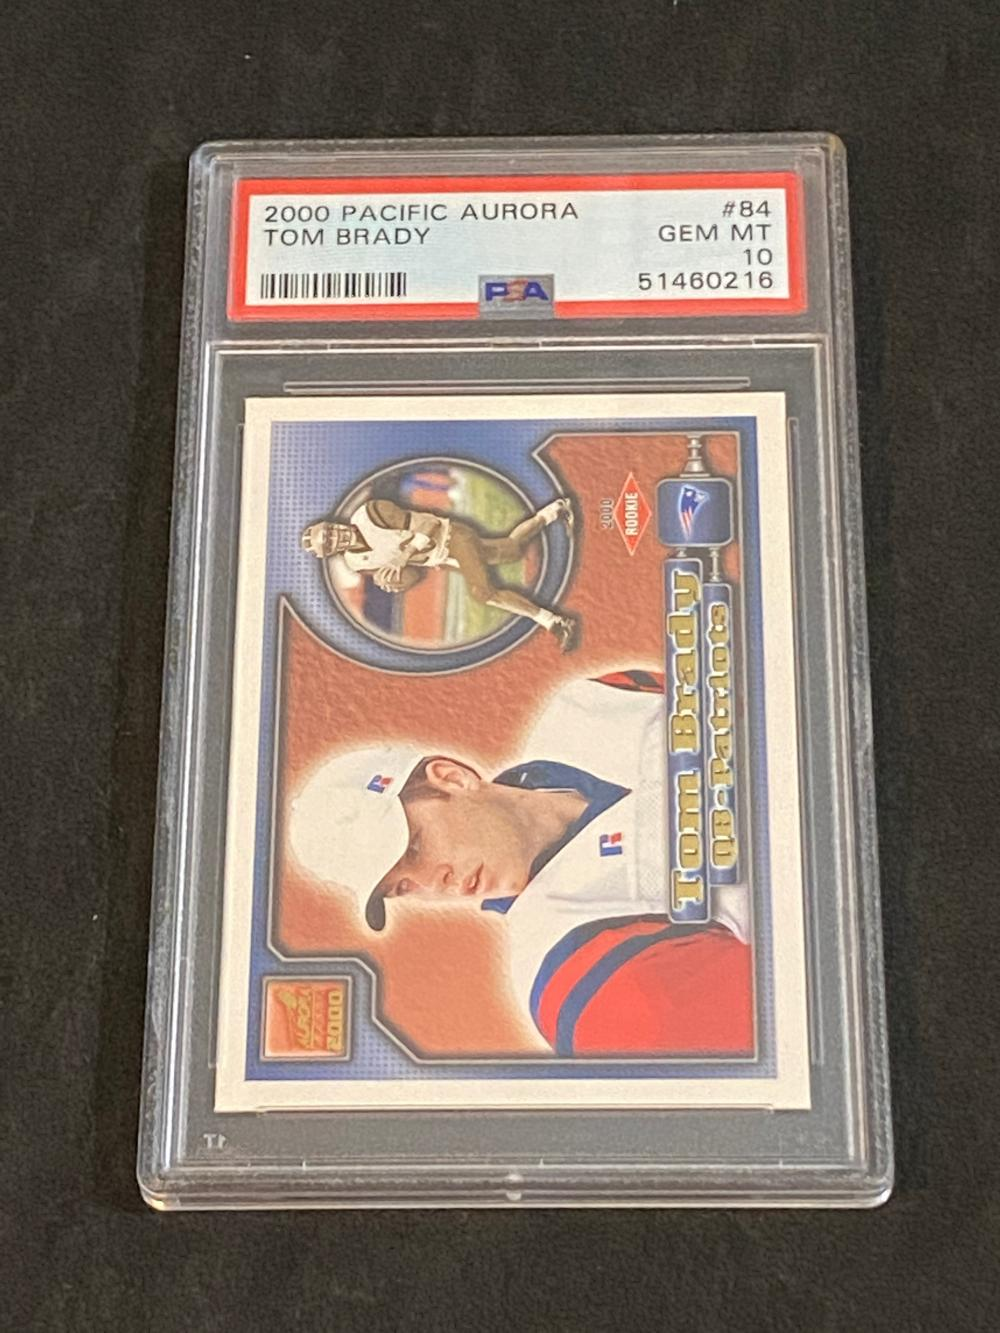 PSA 10 (Gem Mint) 2000 Pacific Aurora Tom Brady Rookie #84 Basketball Card